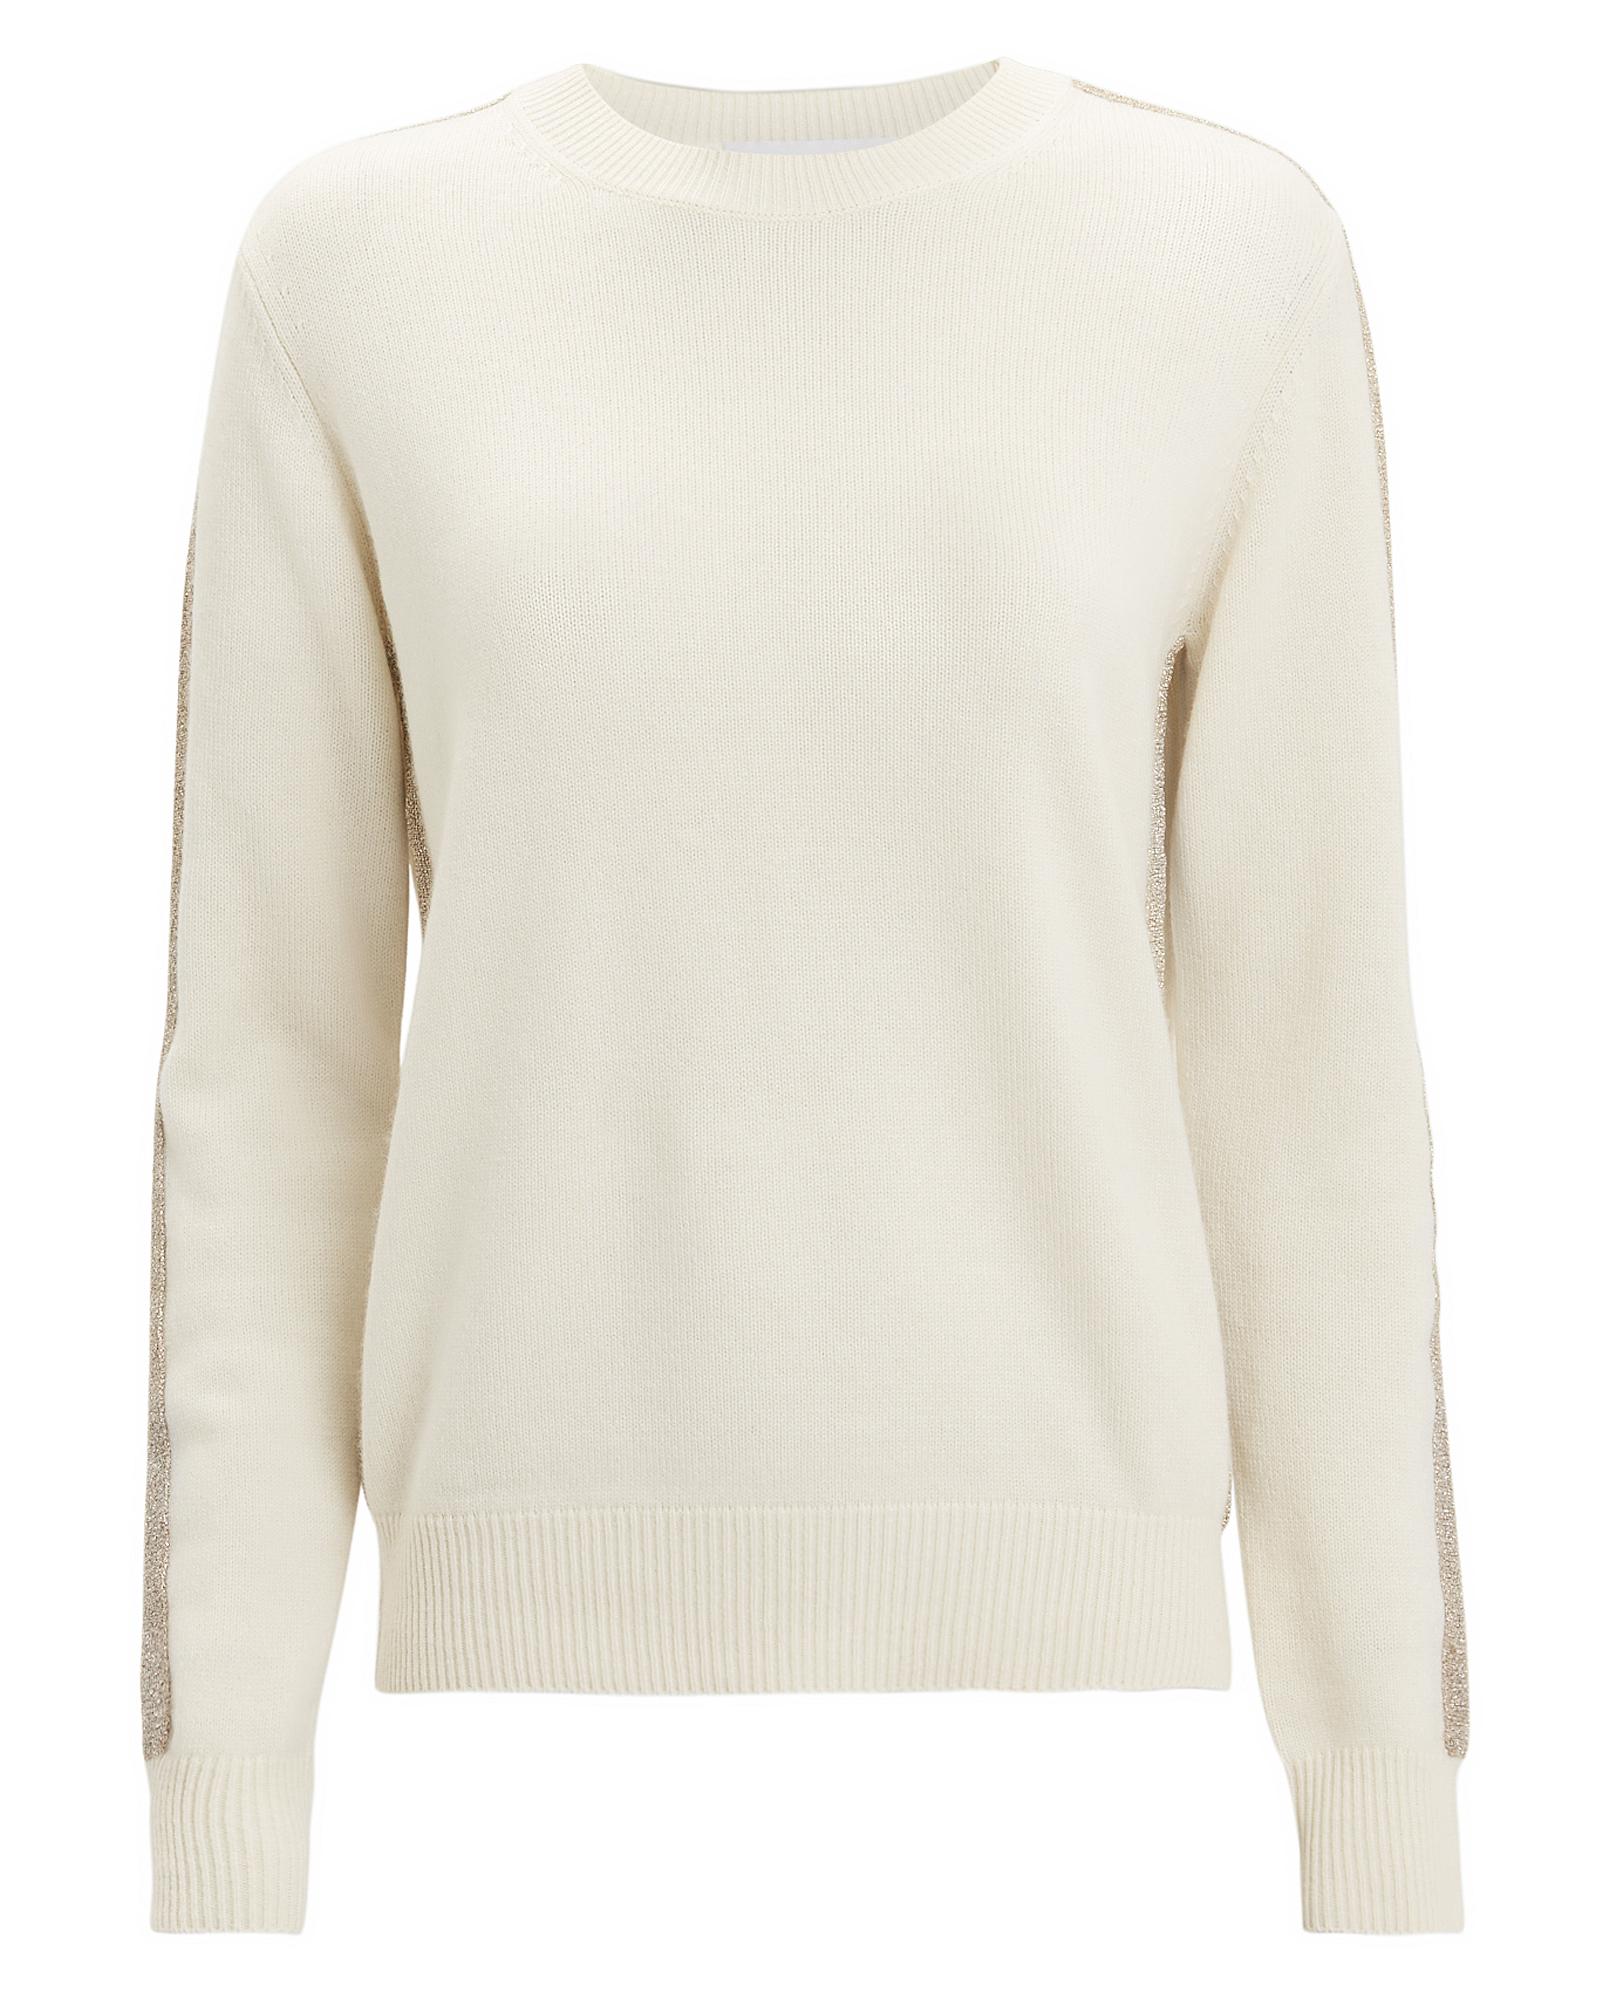 10 CROSBY Ivory Lurex Stripe Sweater